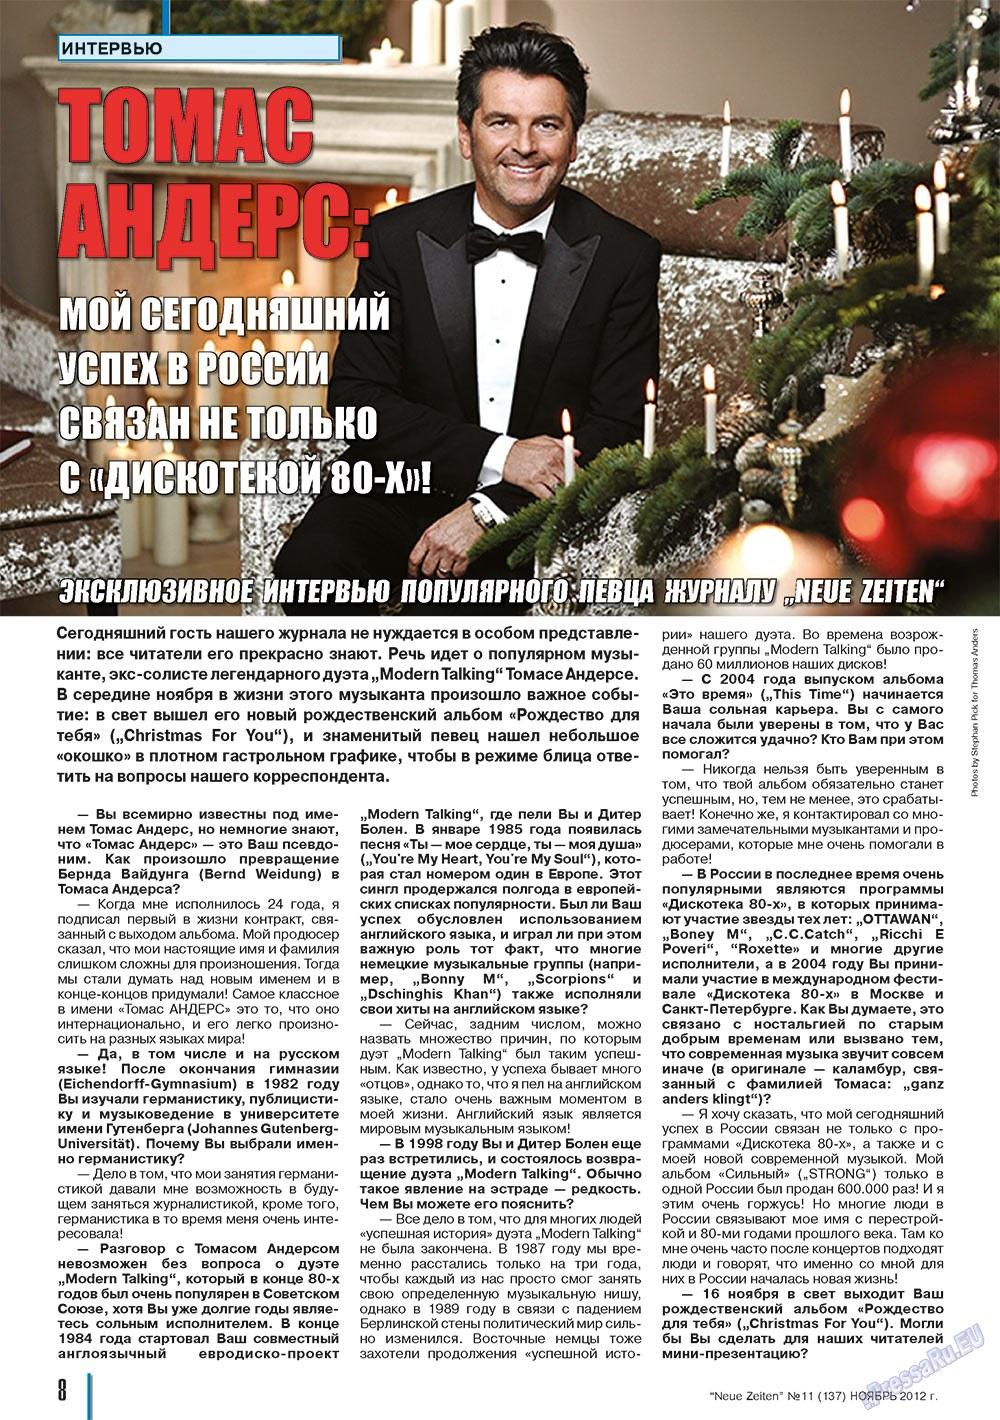 Neue Zeiten (журнал). 2012 год, номер 11, стр. 8